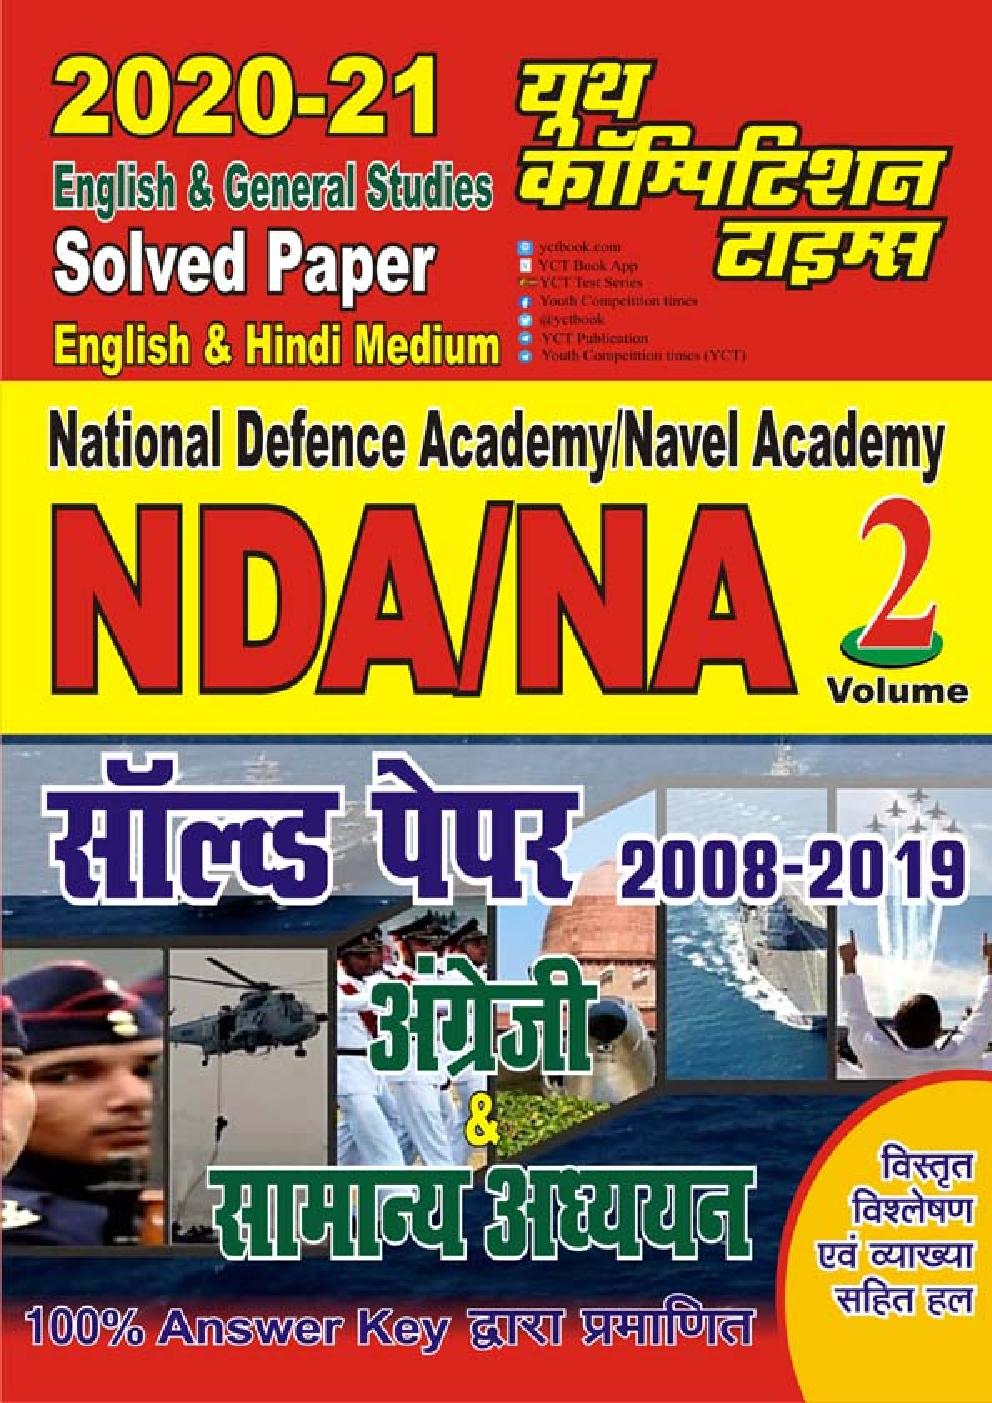 NDA / NA सॉल्वड  पेपर्स अंग्रेजी व सामान्य अध्ययन (2008-2019) - Page 1